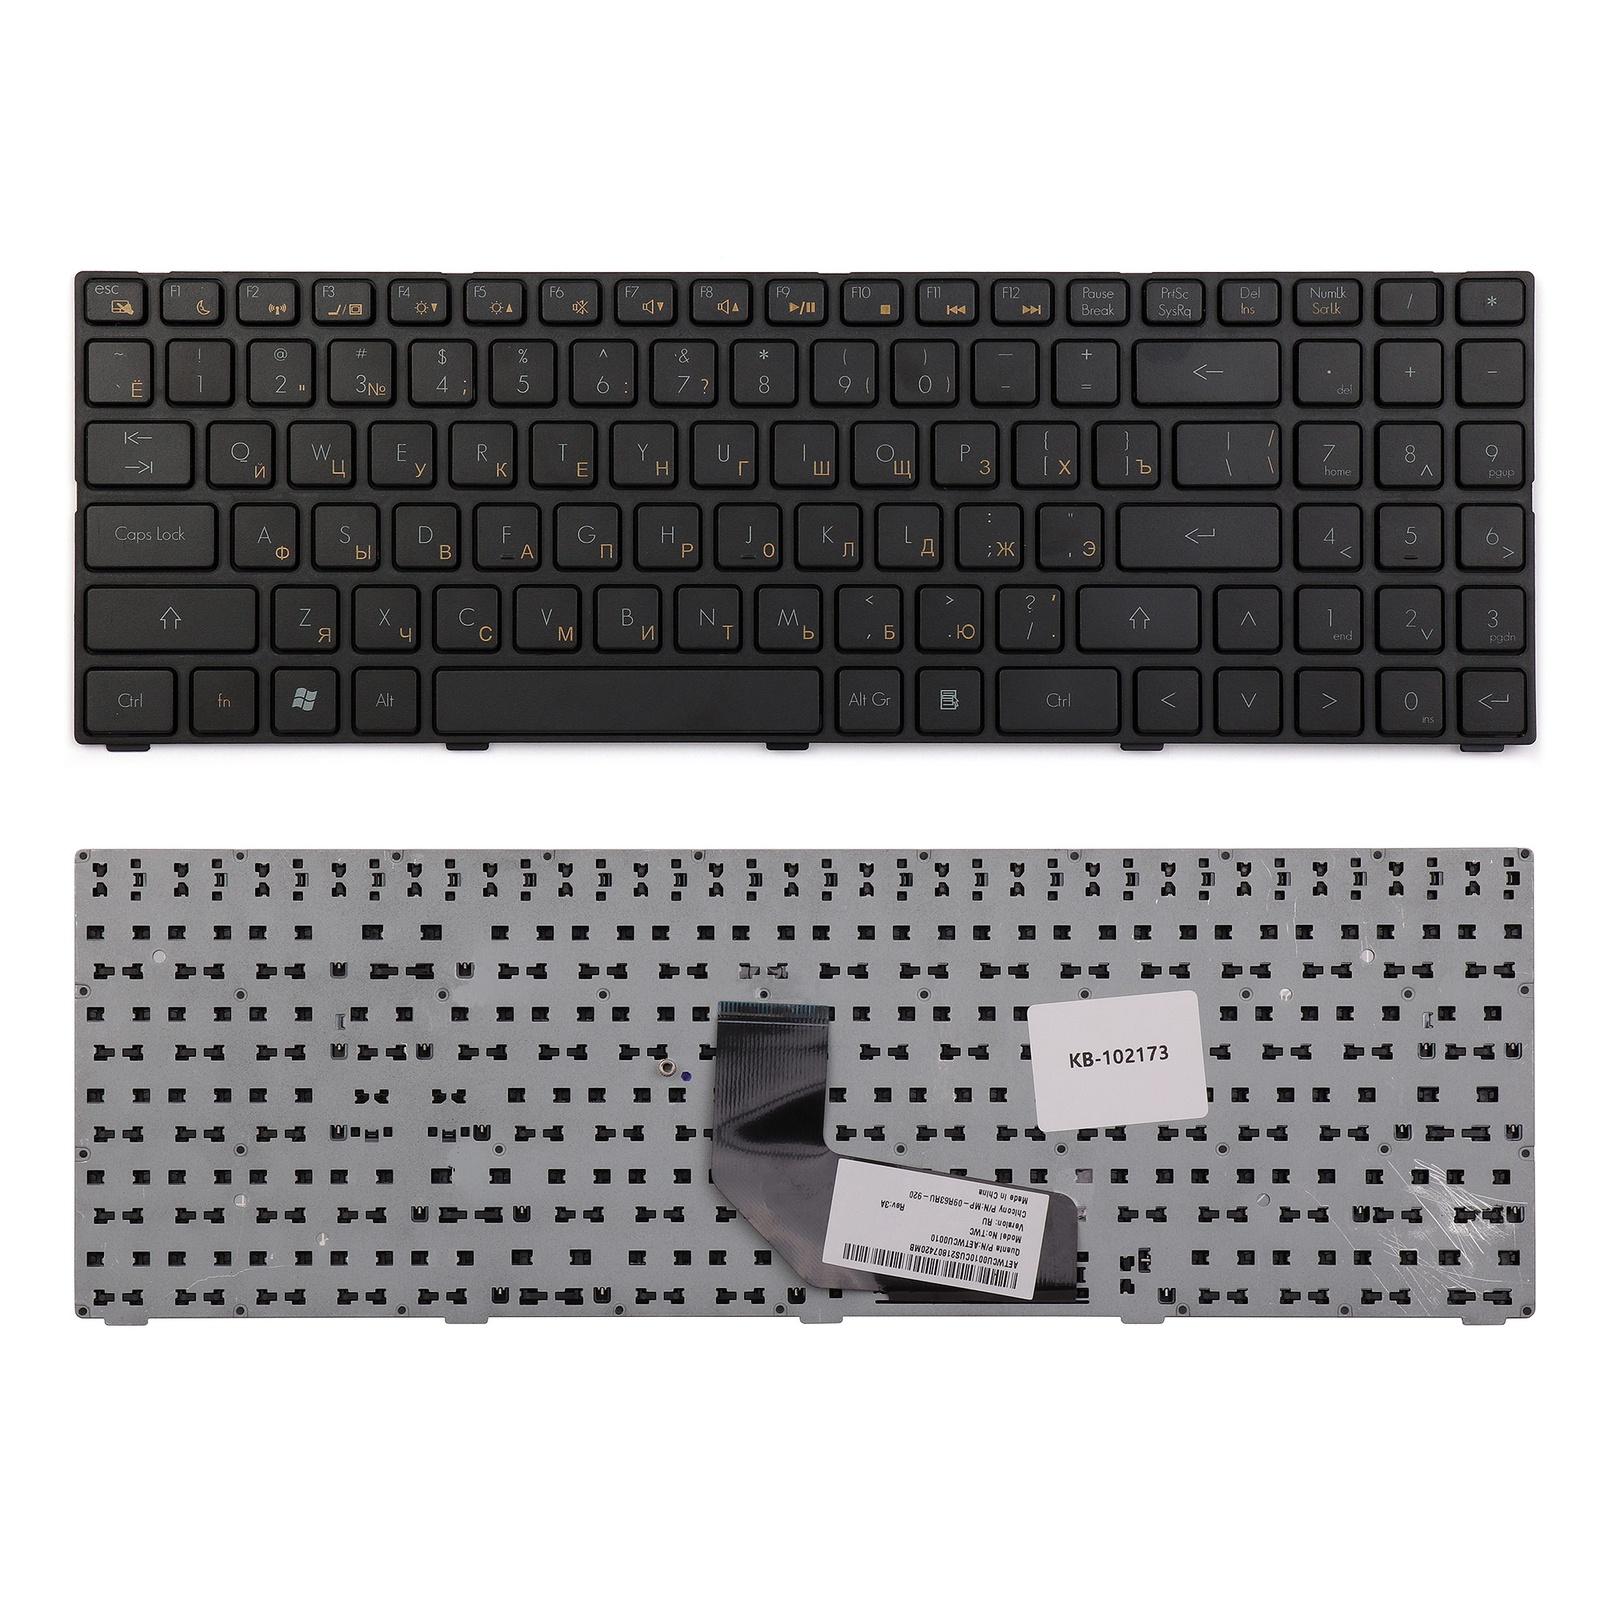 Клавиатура TopOn DNS 0158644, 0162830, TWC 580 Series. Плоский Enter. С рамкой. PN: TWC-N13P-GS, AETWC700010., KB-102173, черный все цены